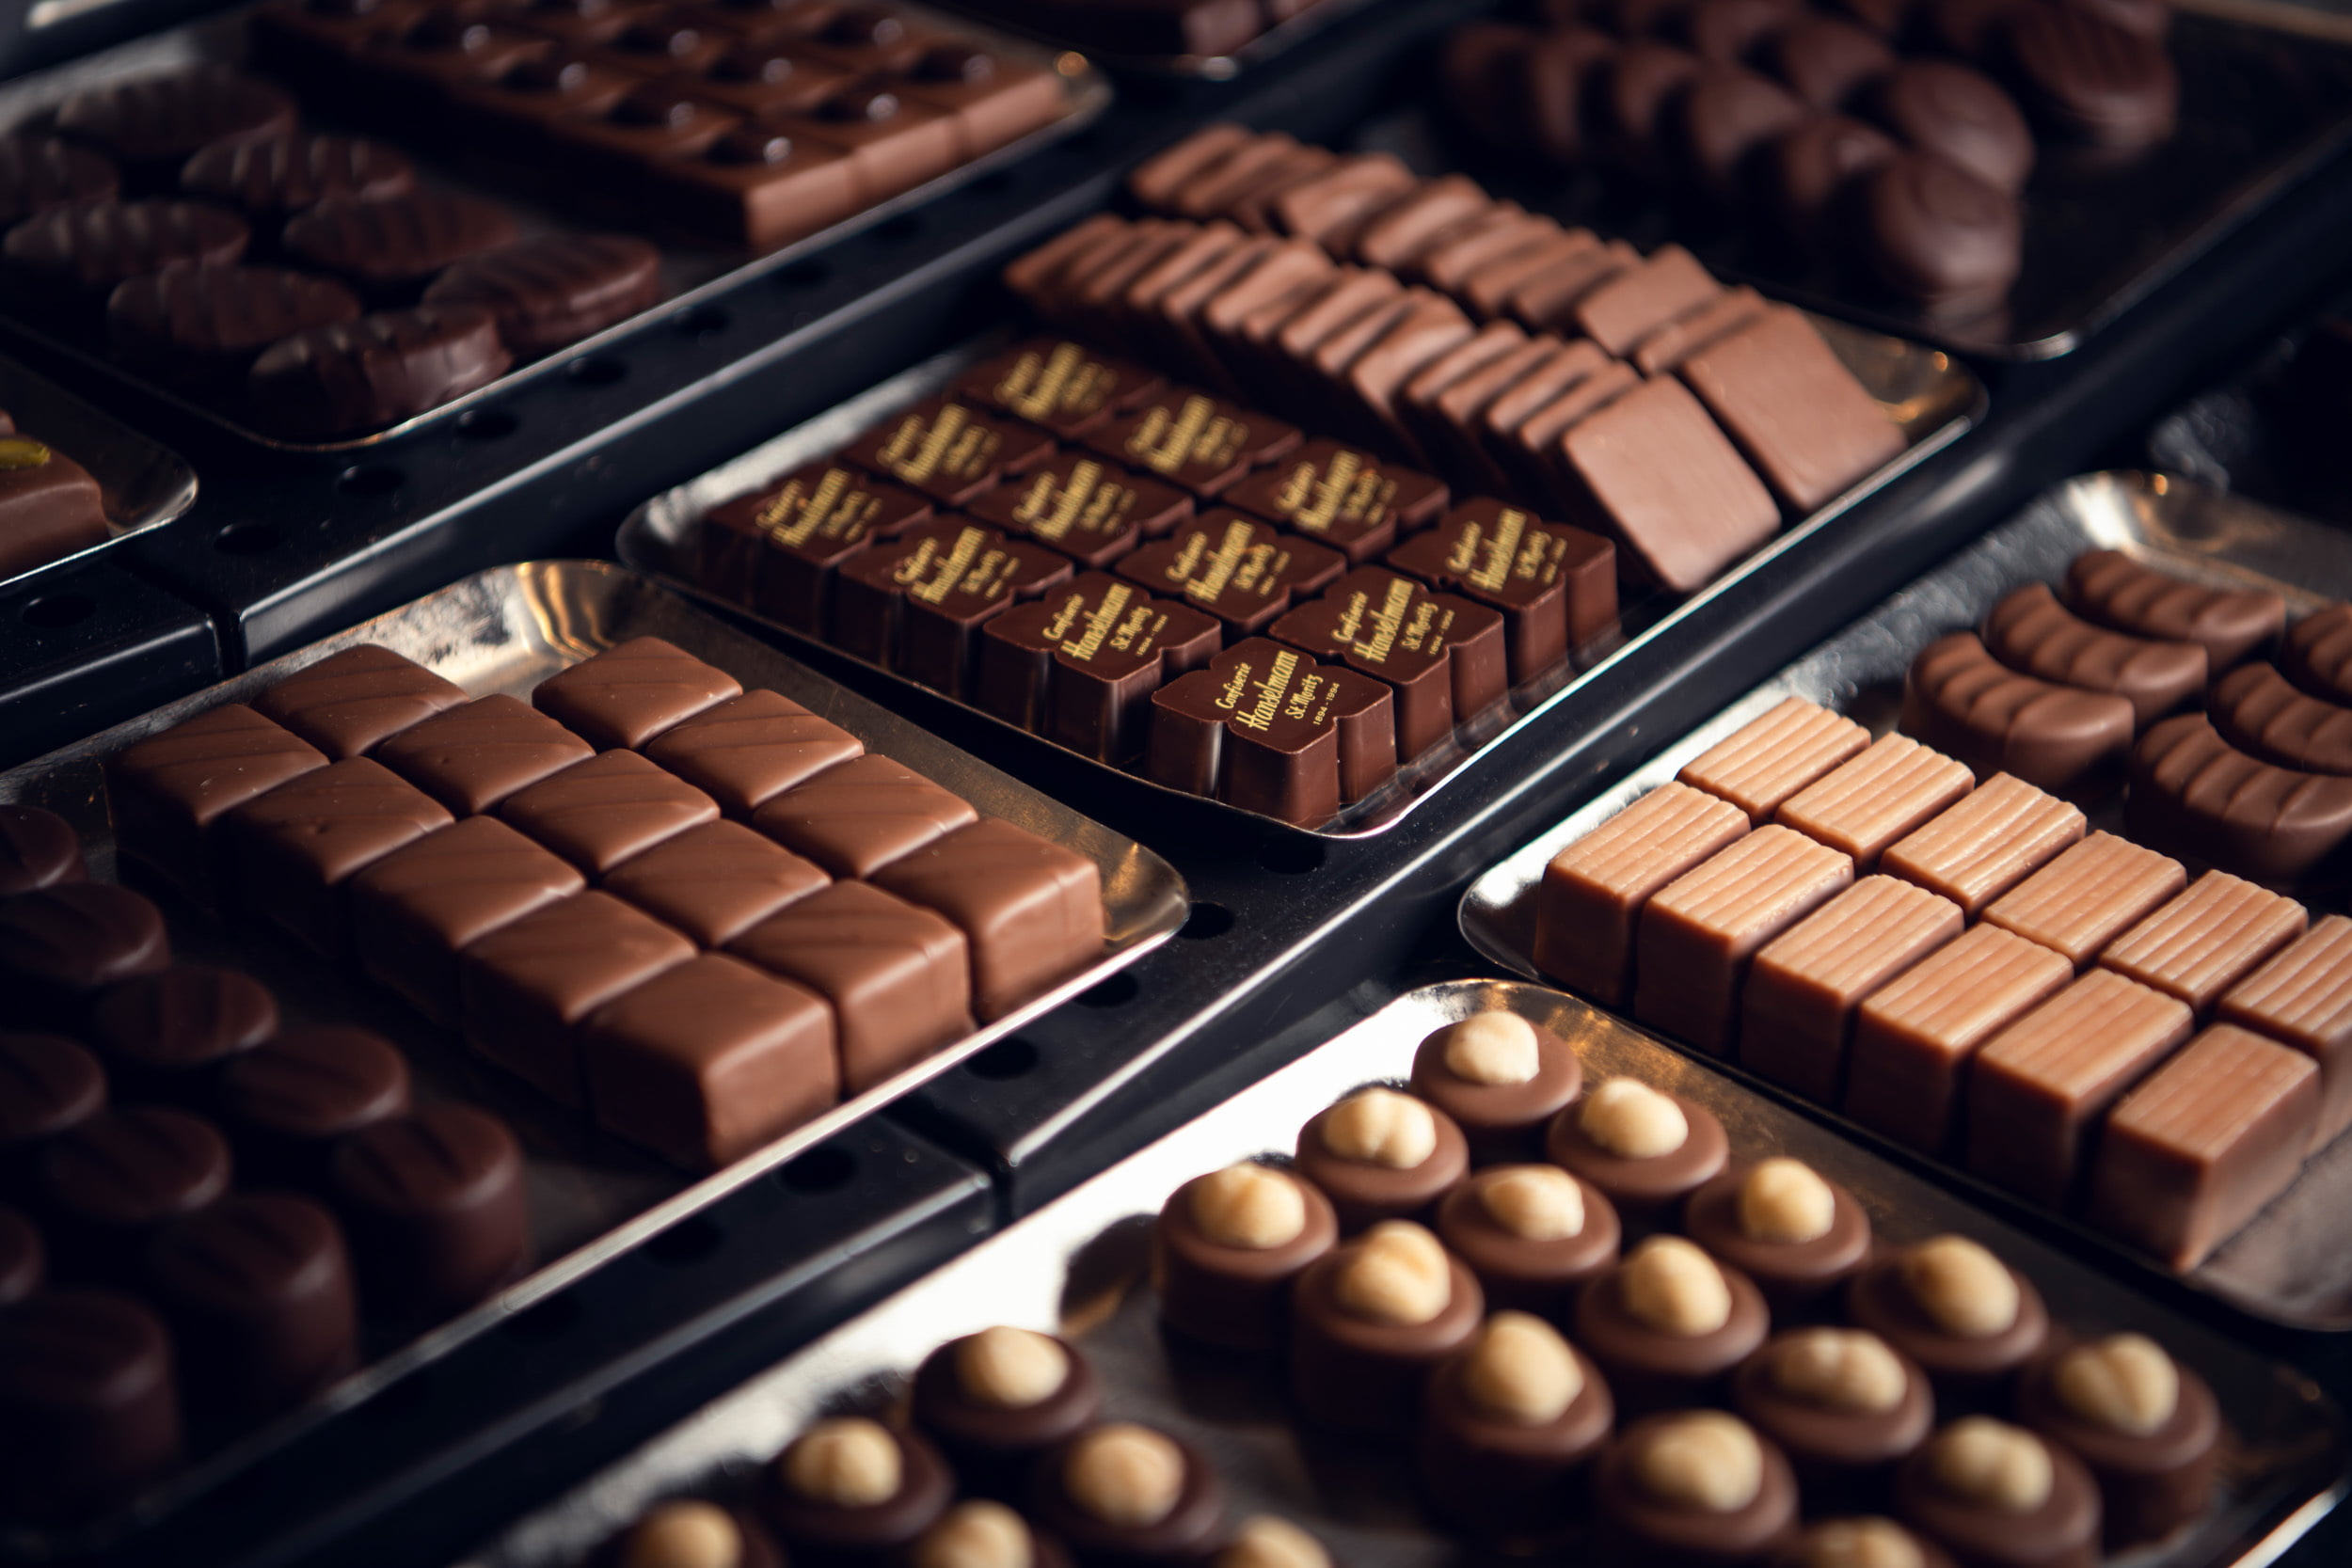 Chocolate specialties Hanselmann St. Moritz